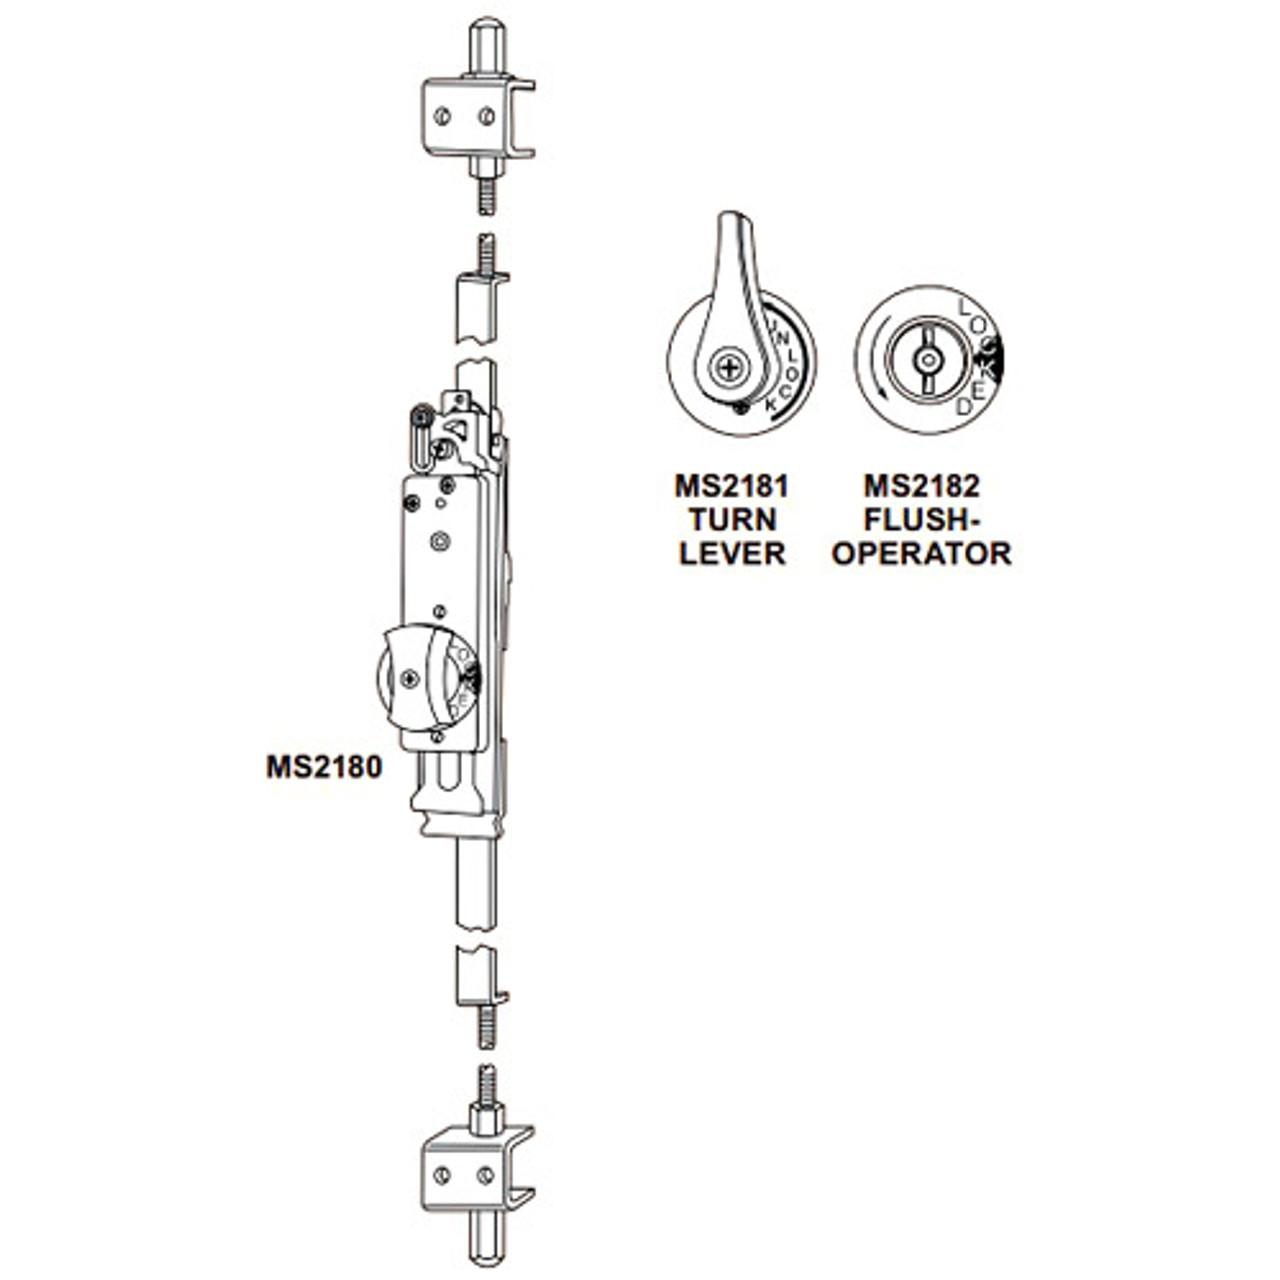 MS2180-07-119 Adams Rite Flushbolt in Black Finish